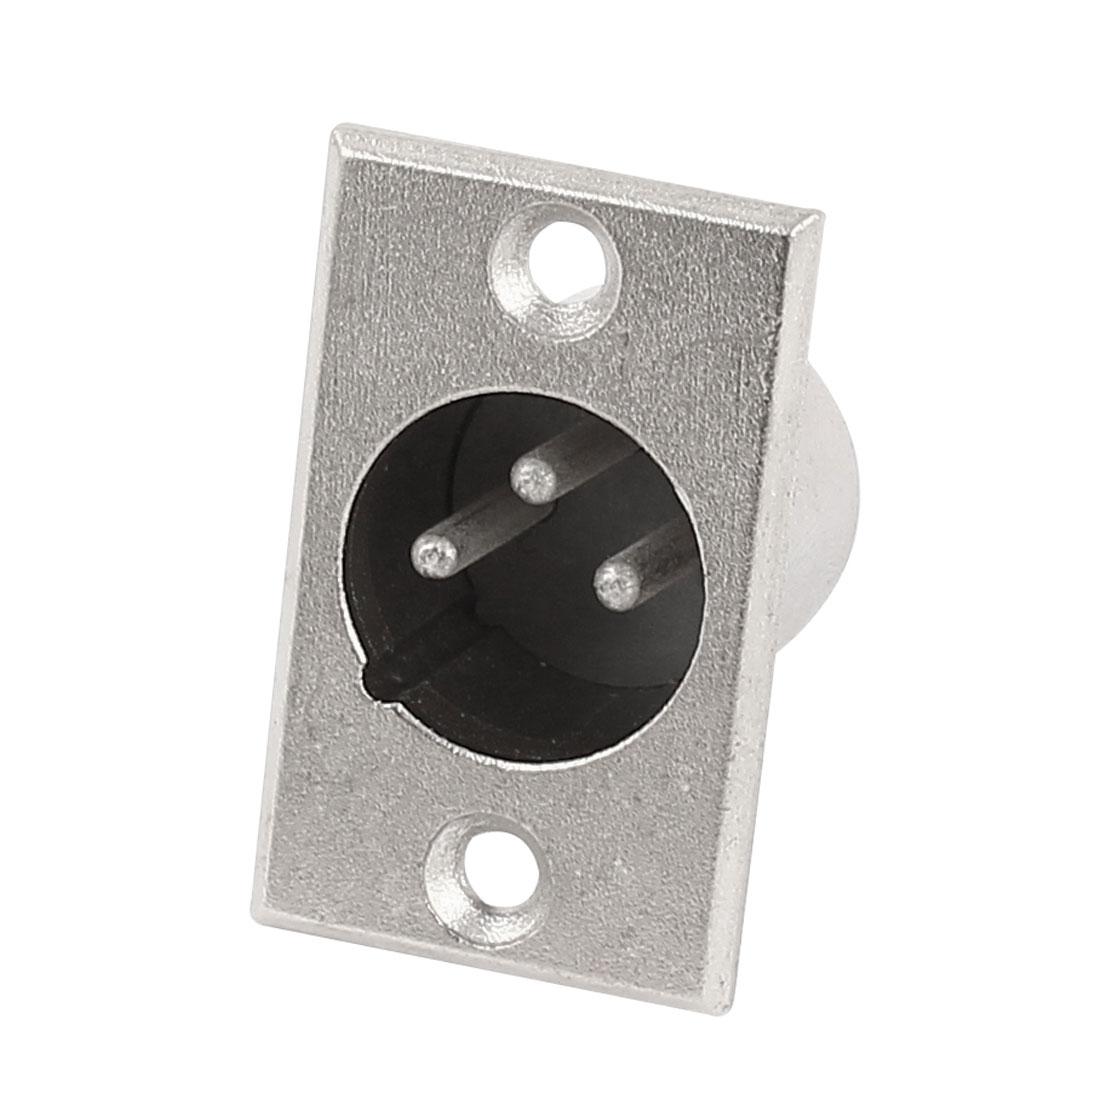 Rectangle Silver Tone Metal 3-Pin XLR Male Microphone Speaker Socket